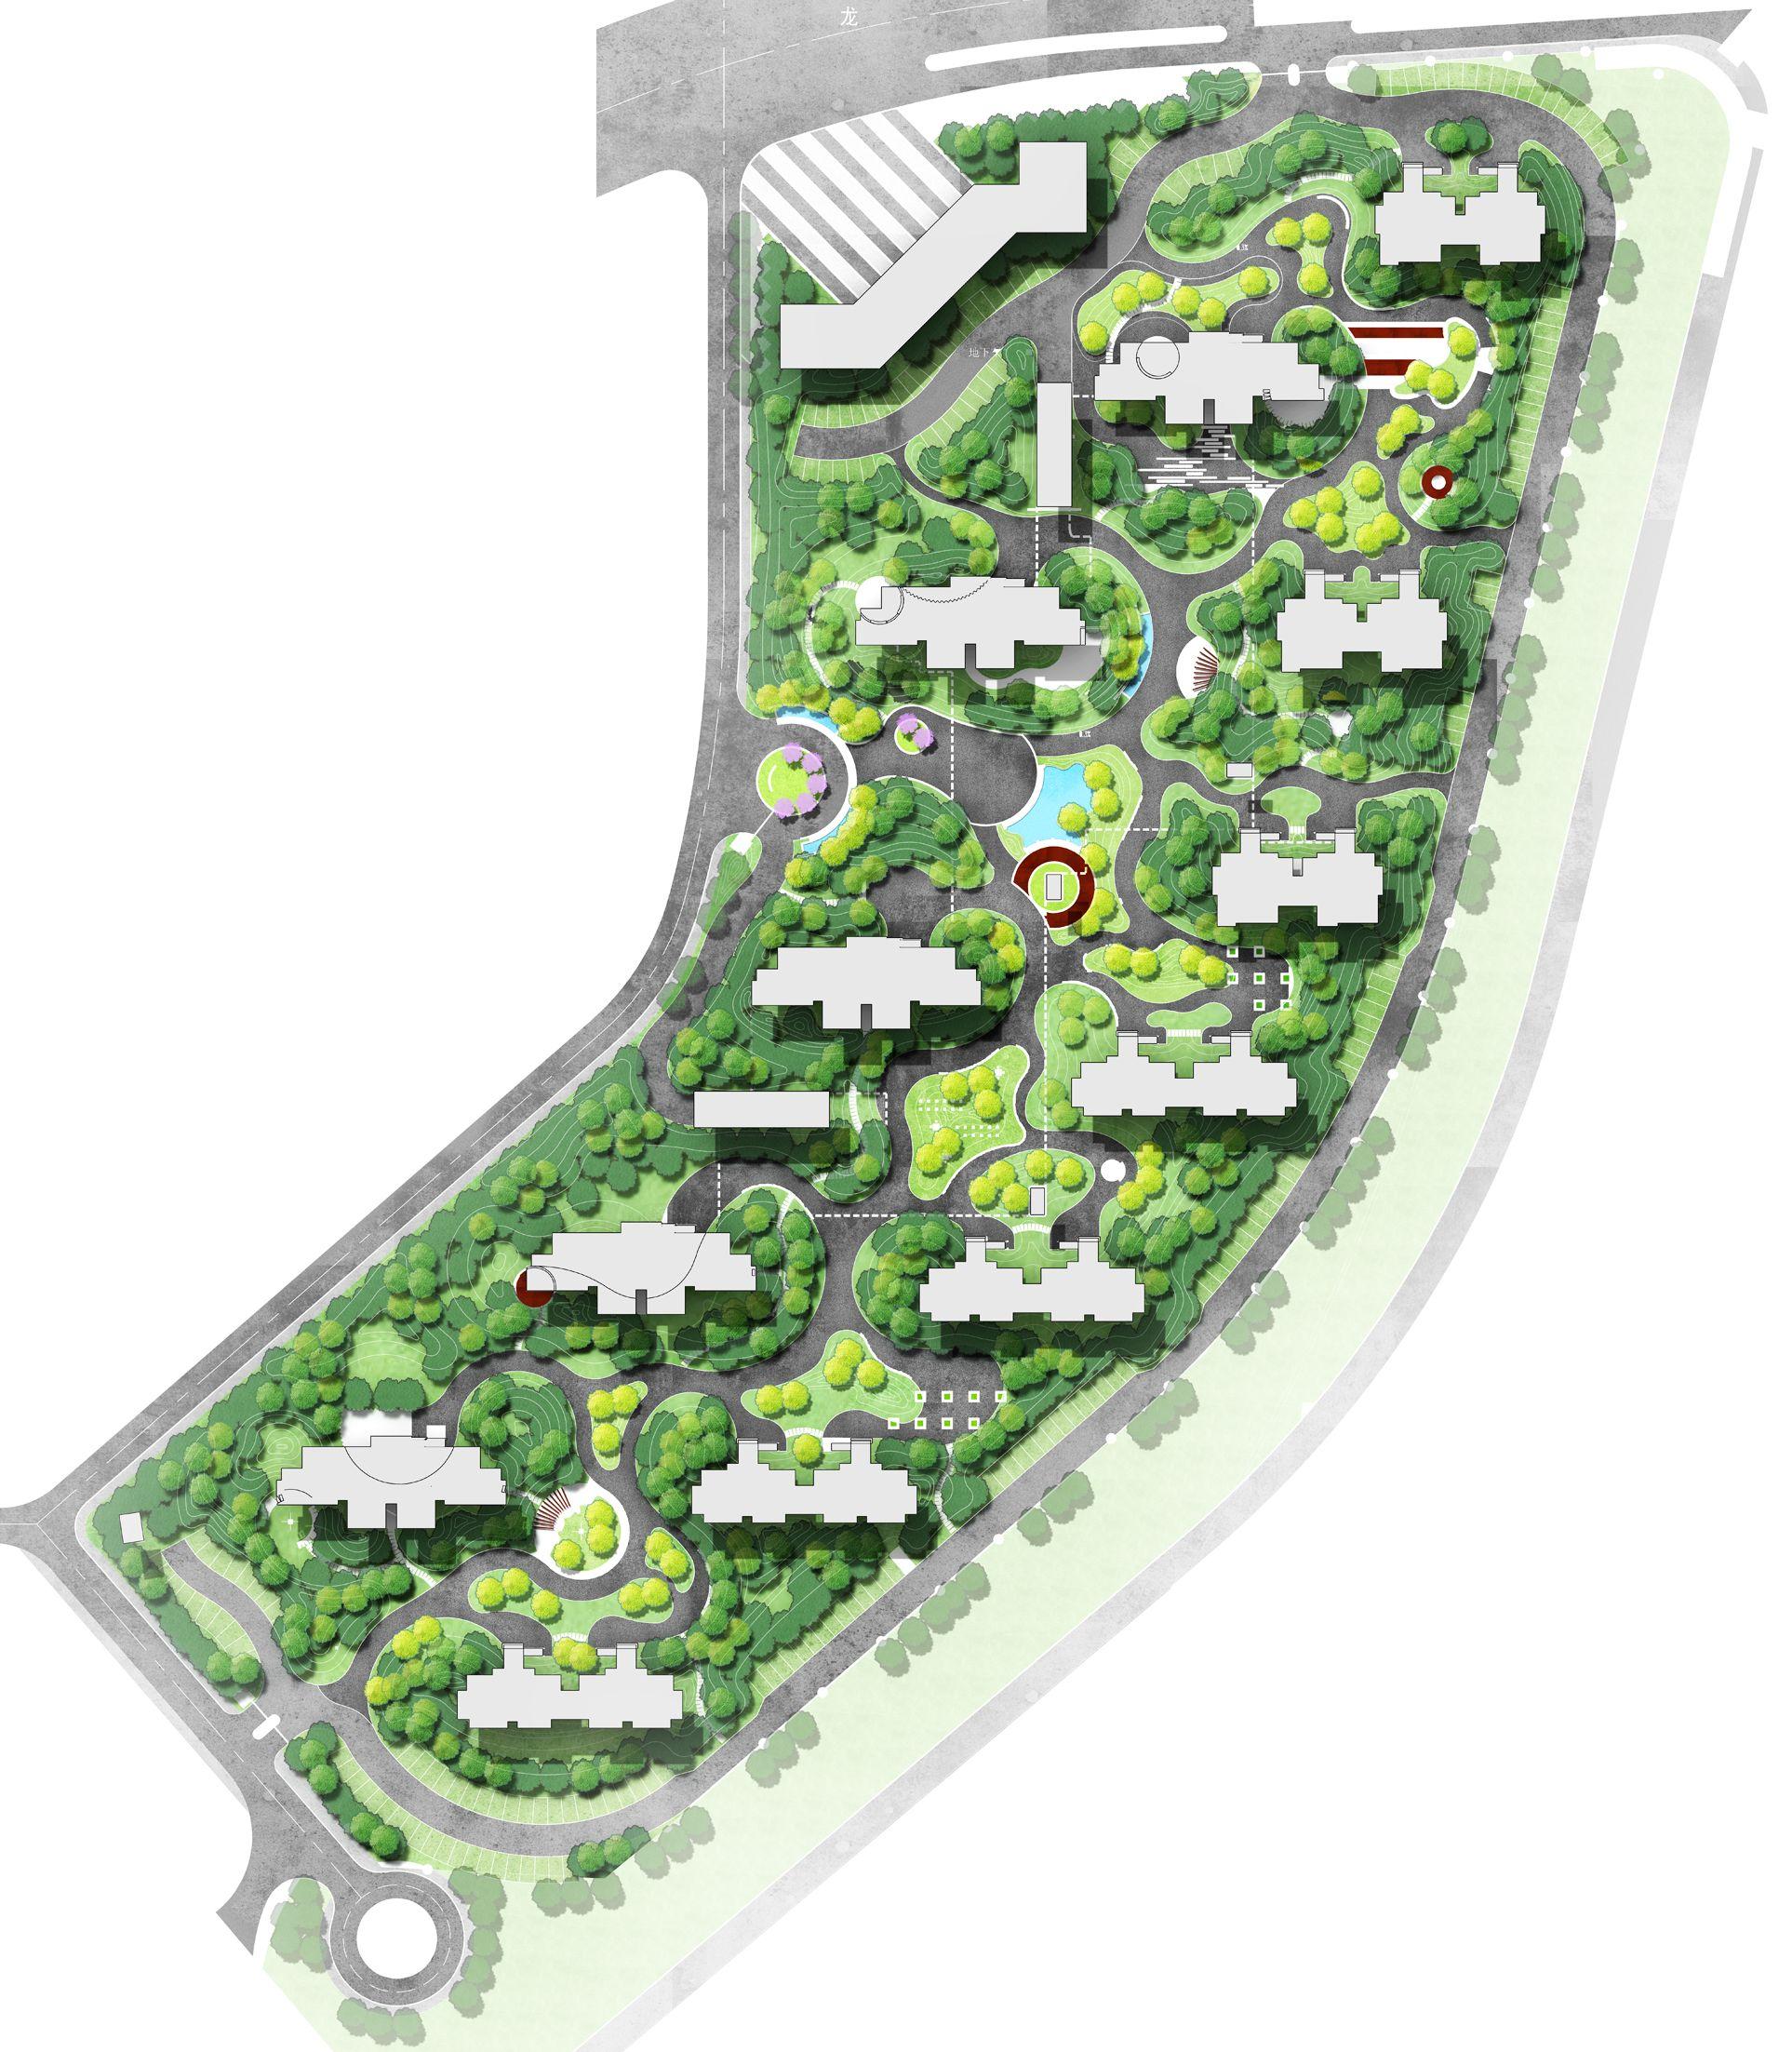 Pin By Eleven On Masterplan Urban Planning Master Plan Landscape